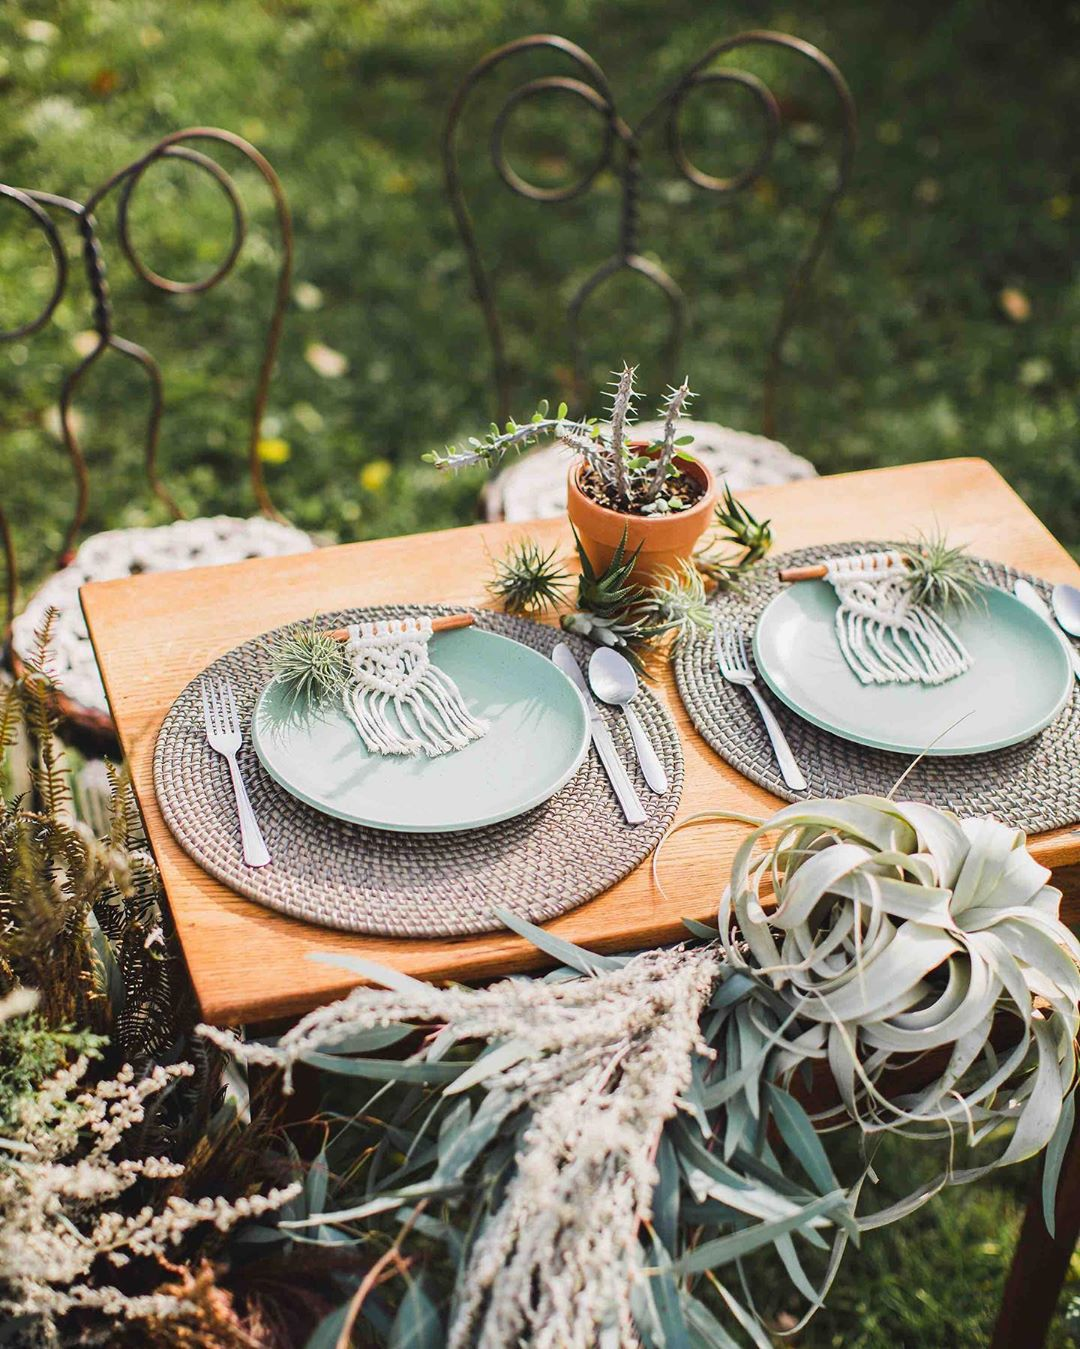 {table for ✌?} . . photo | @erikafollansbee  design/florals| @lotusfloraldesigns  macrame| @rissa.bee . . #sweethearttable #hisandhers #tablefortwo #boho #bohostyle #macrame #succulents #cacti #lotusfloraldesigns #wedding #weddinginspo #styledshoot